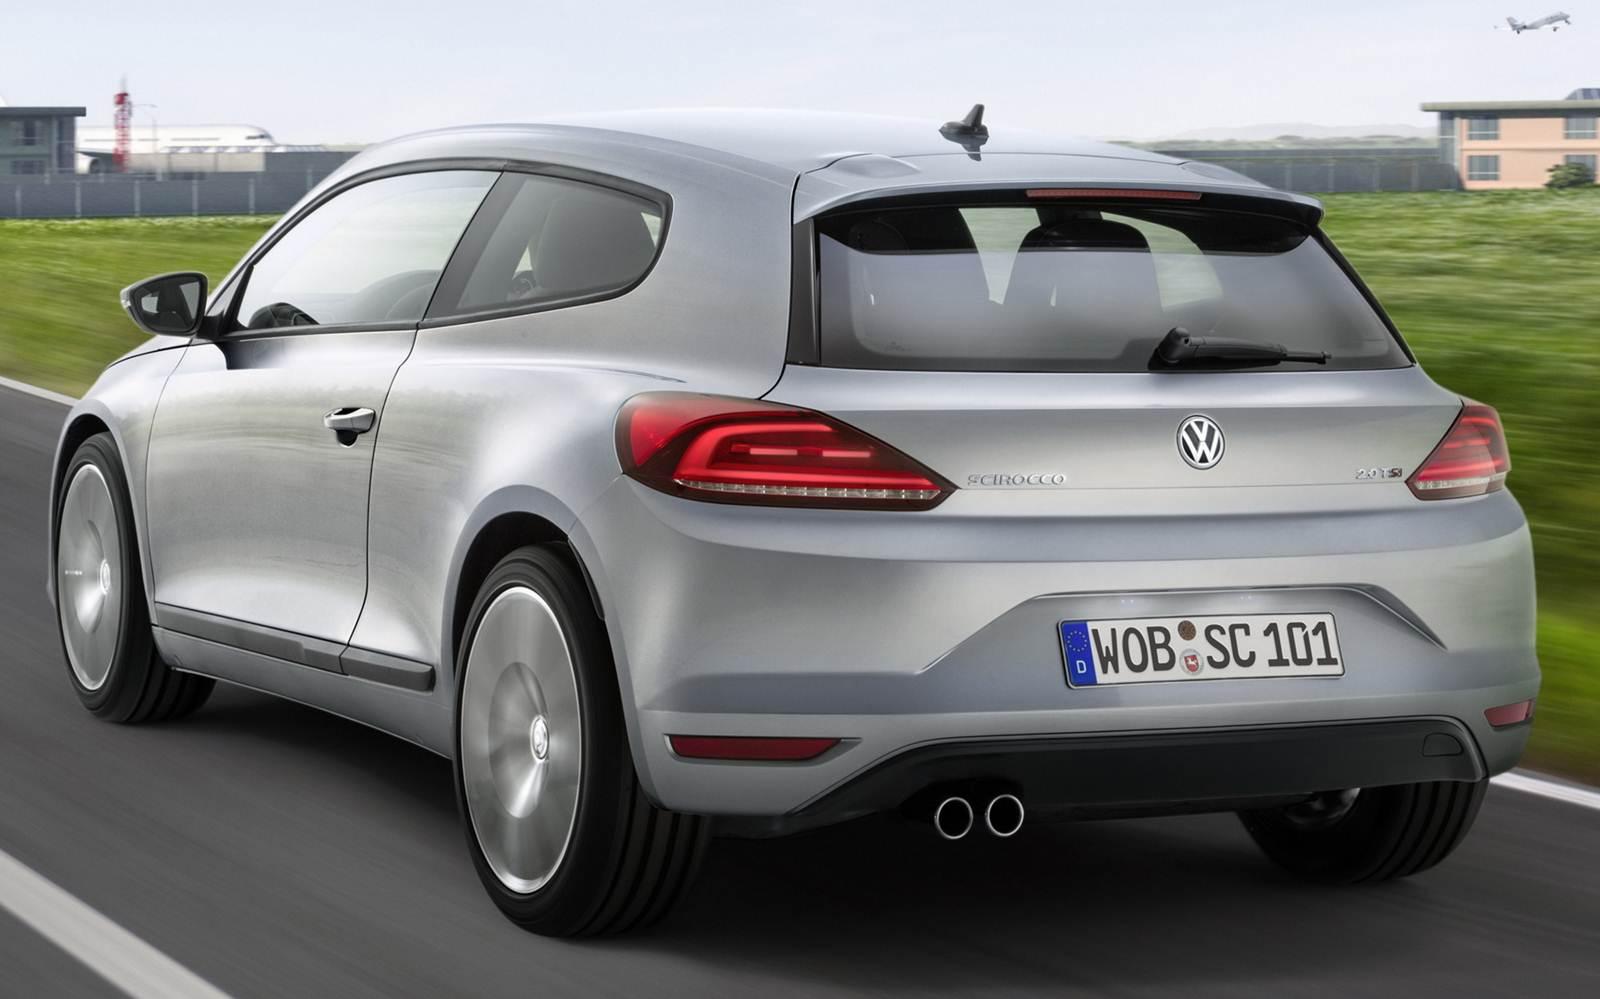 Novo Volkswagen Scirocco 2015